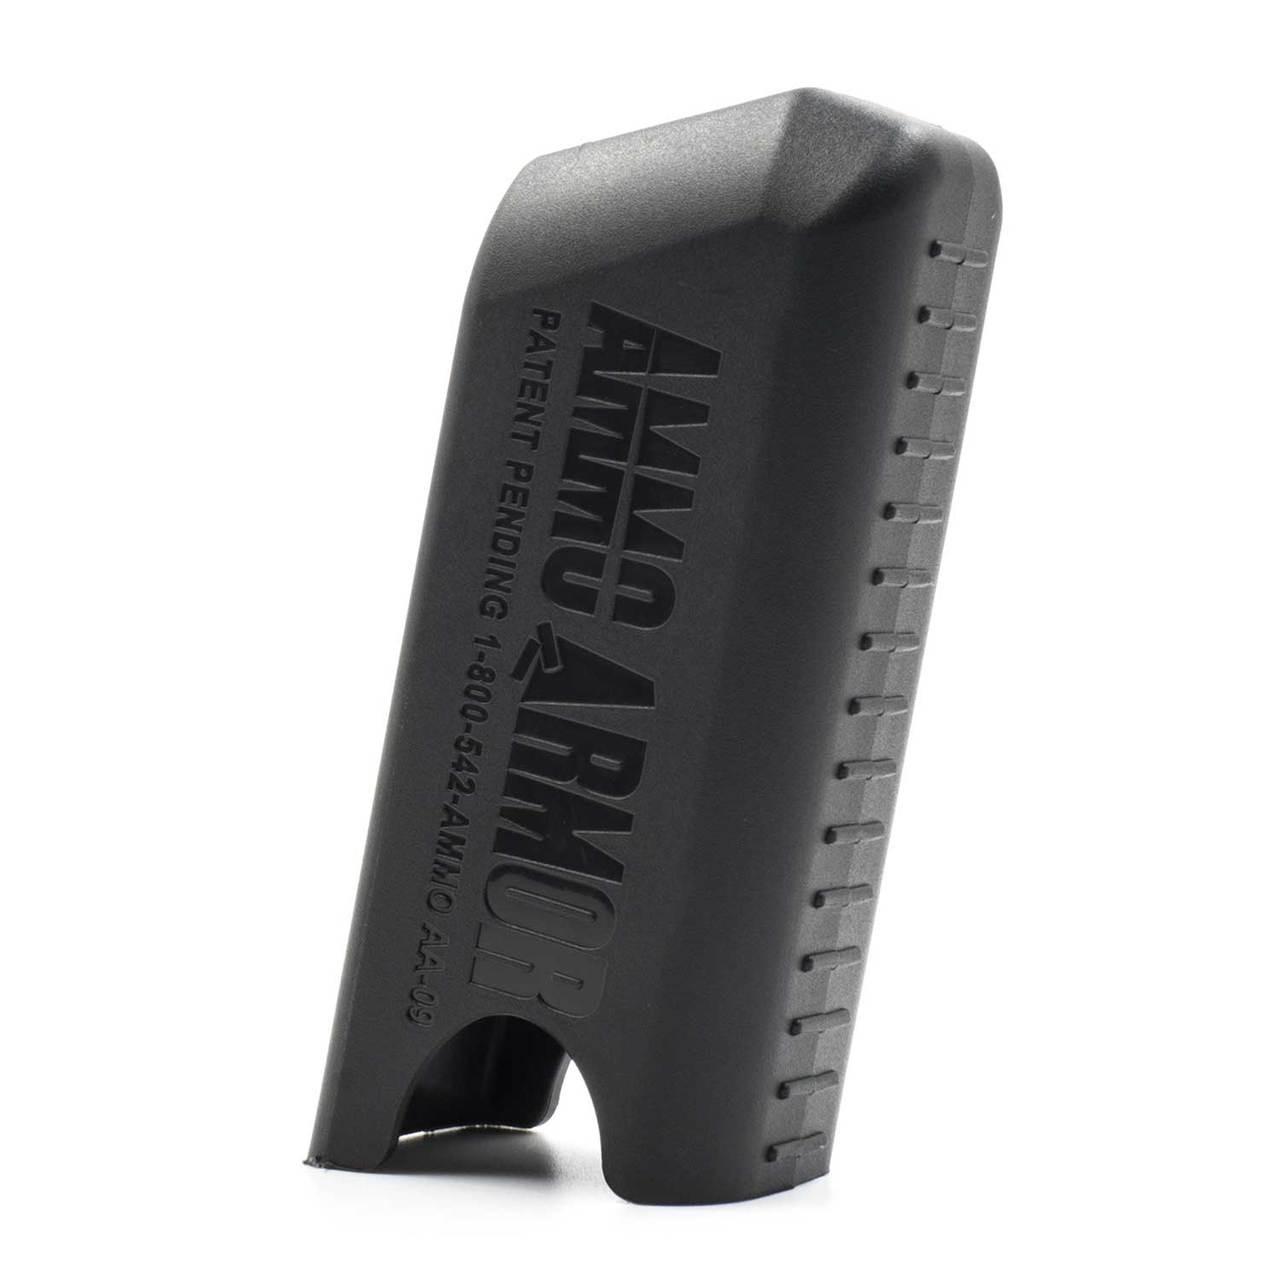 Glock 26 Ammo Armor